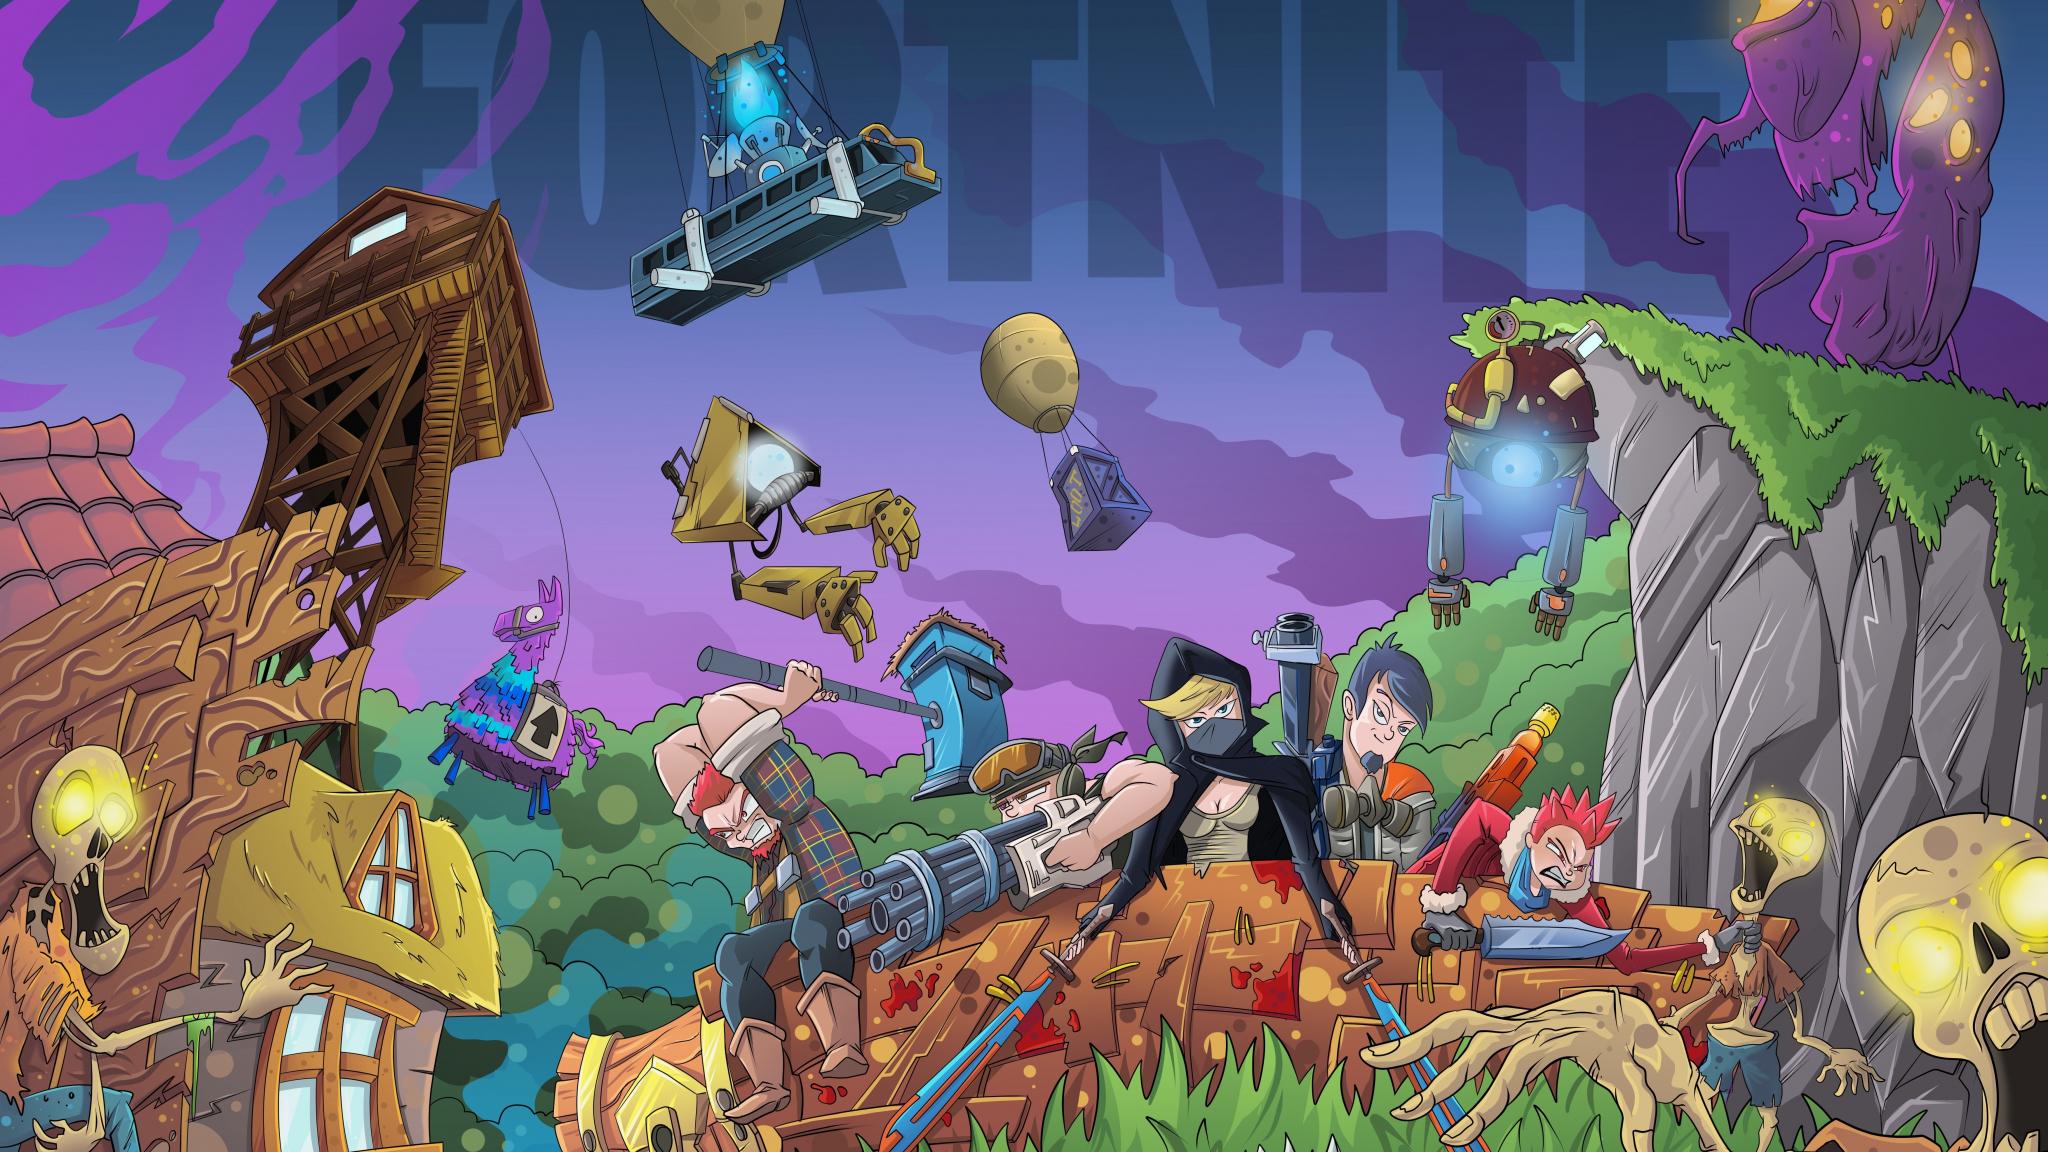 Download 2048x1152 Wallpaper Fortnite Video Game Landscape Dual